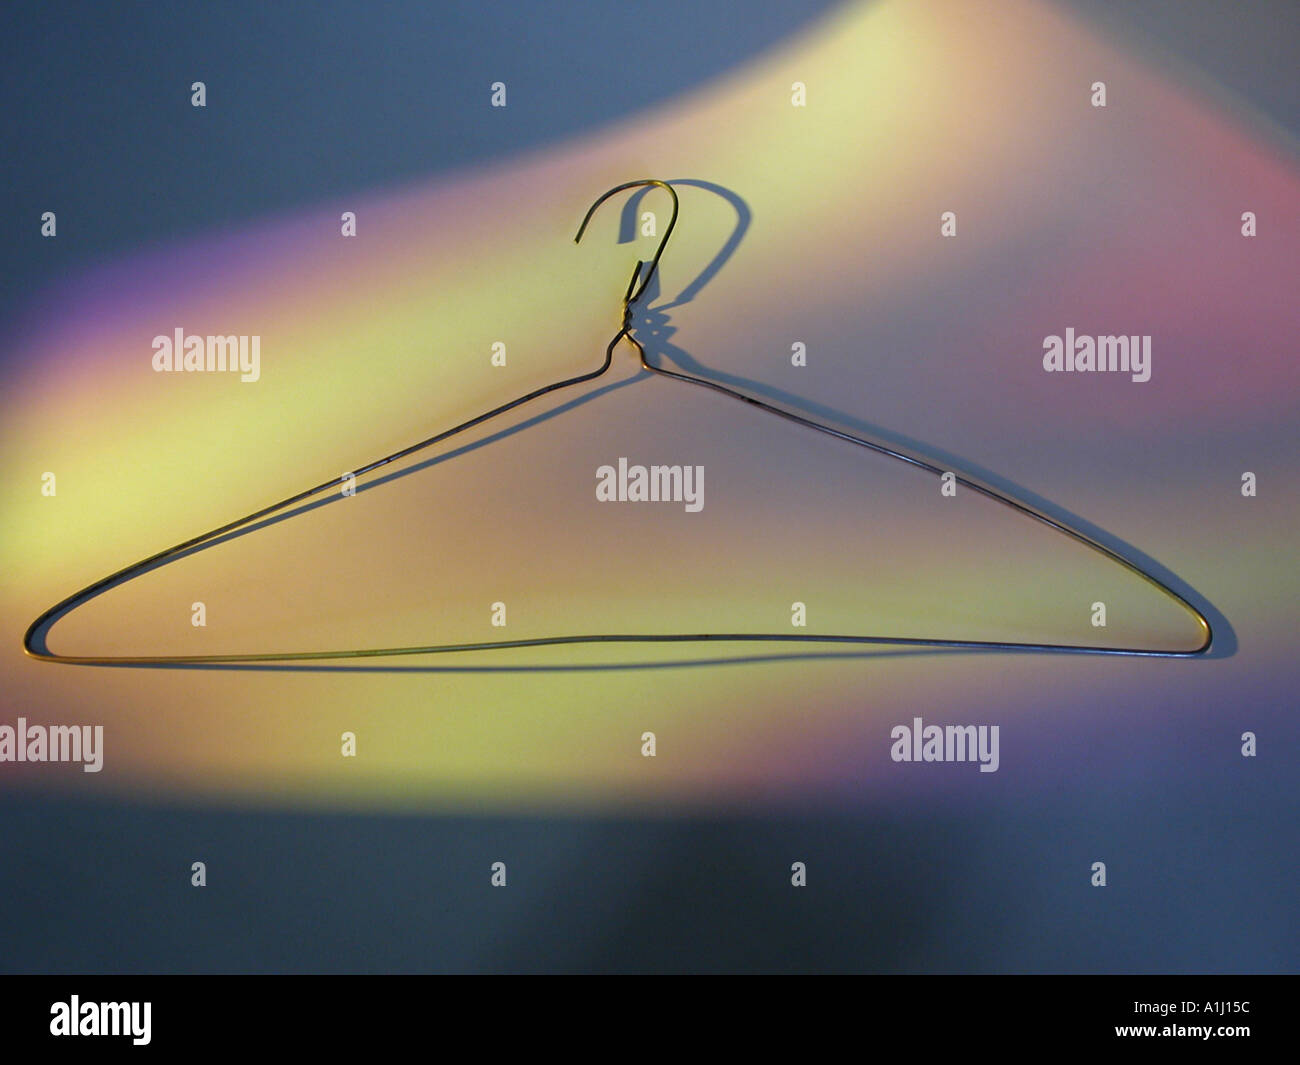 Metal hanger - Stock Image